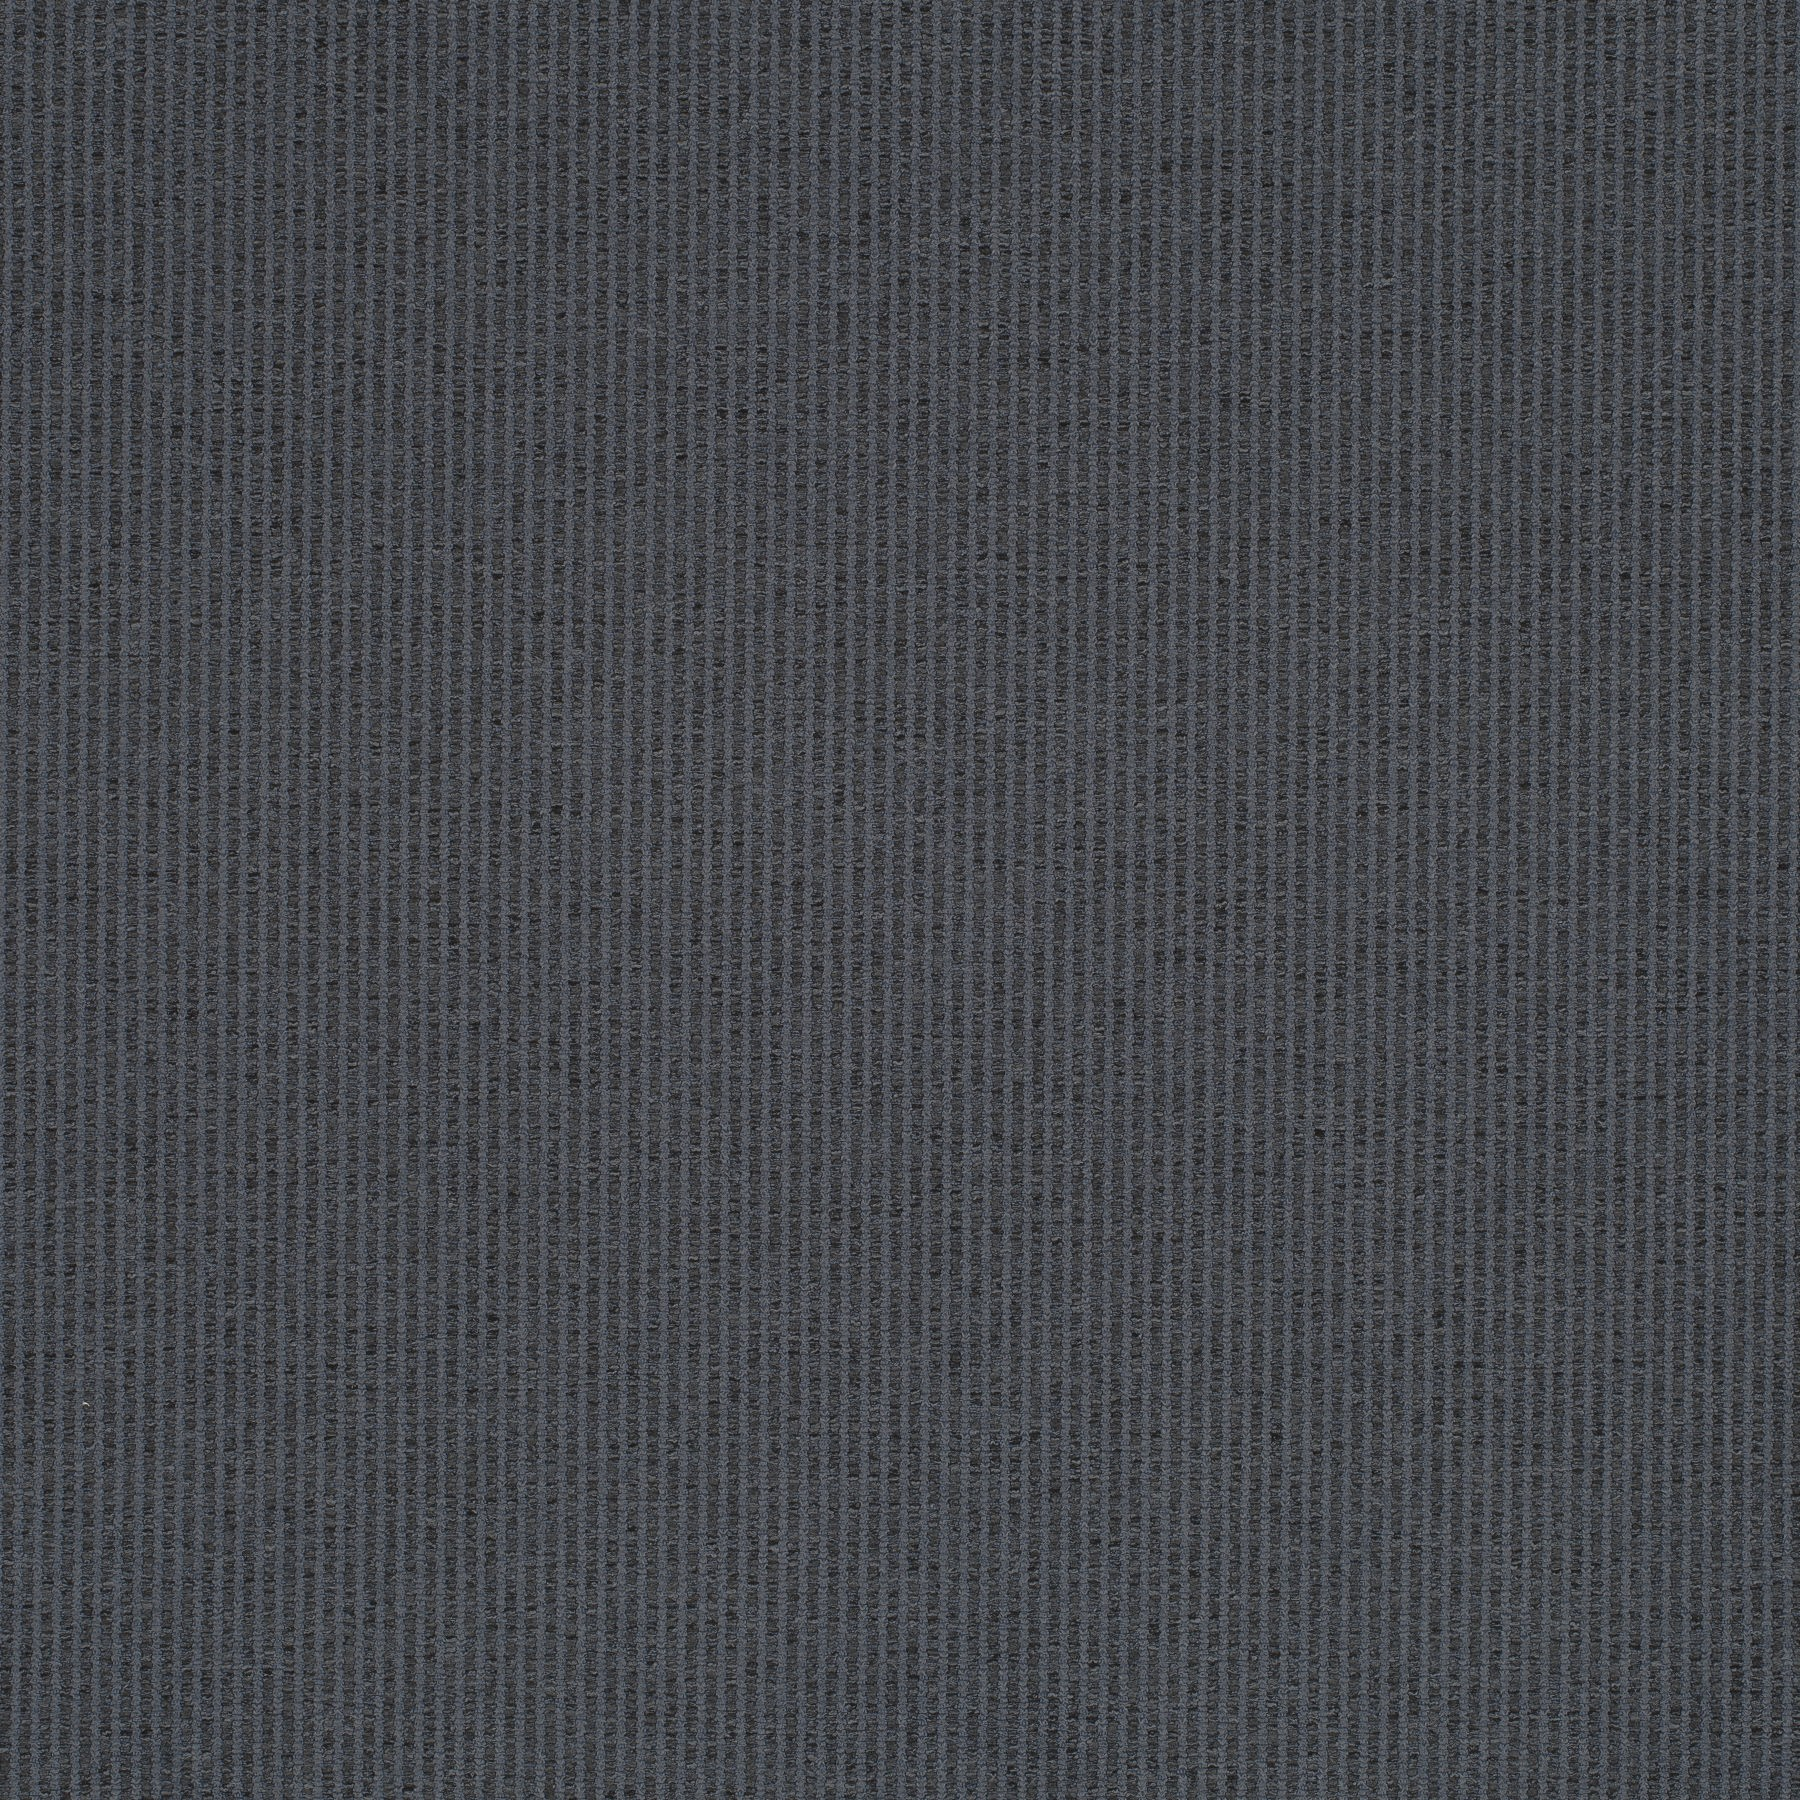 upholstery fabric fred 1 1299 050 jab anstoetz fabrics. Black Bedroom Furniture Sets. Home Design Ideas